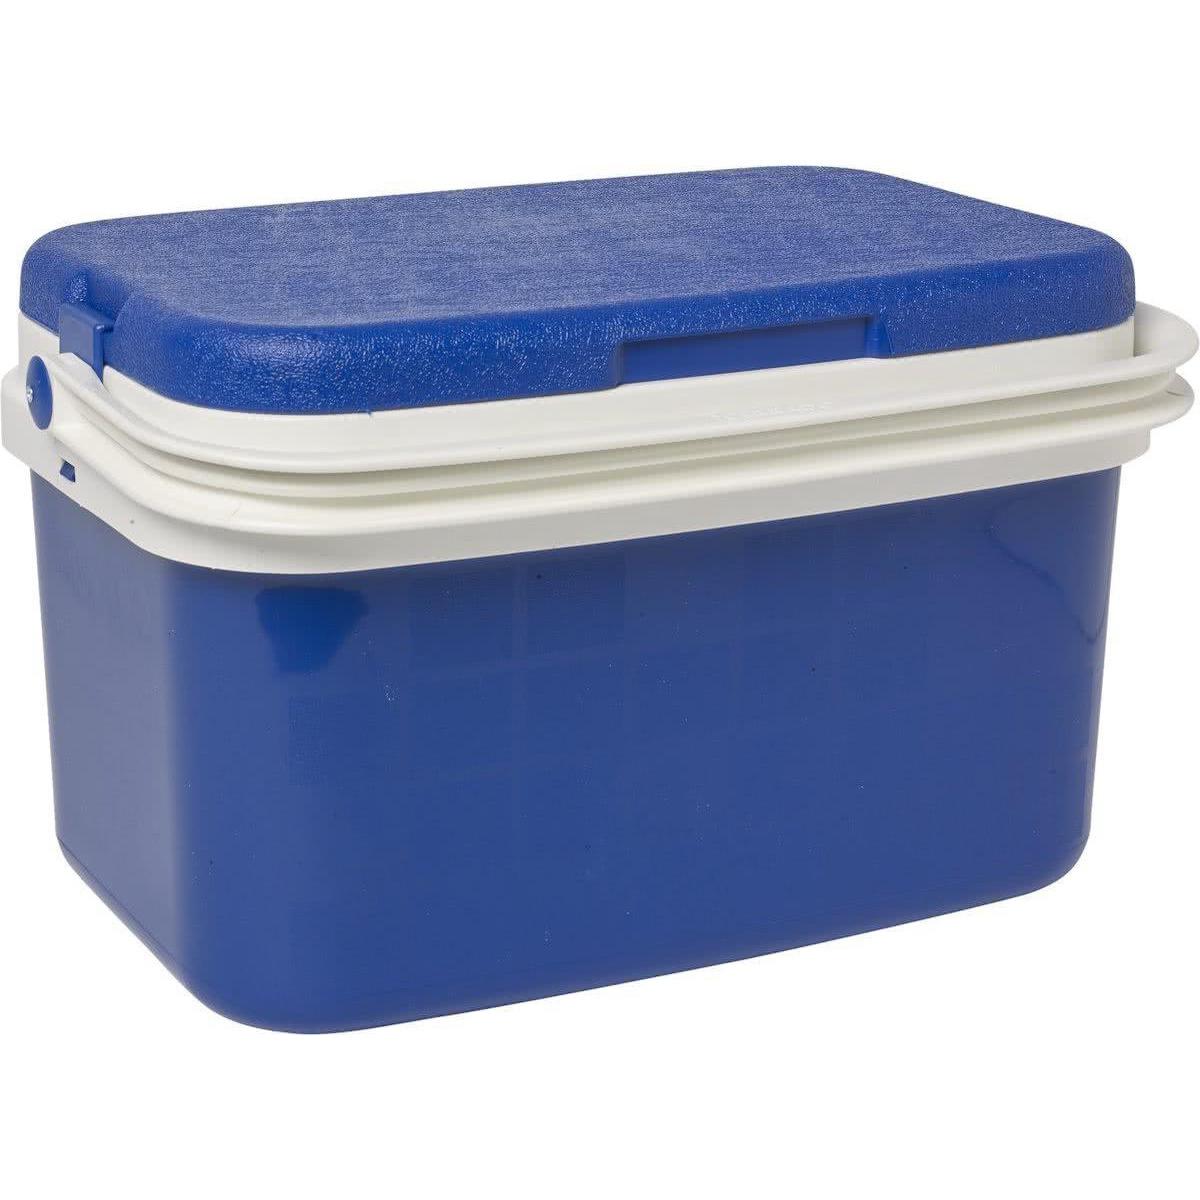 Koelbox donkerblauw 16 liter 42 x 29 x 26 cm